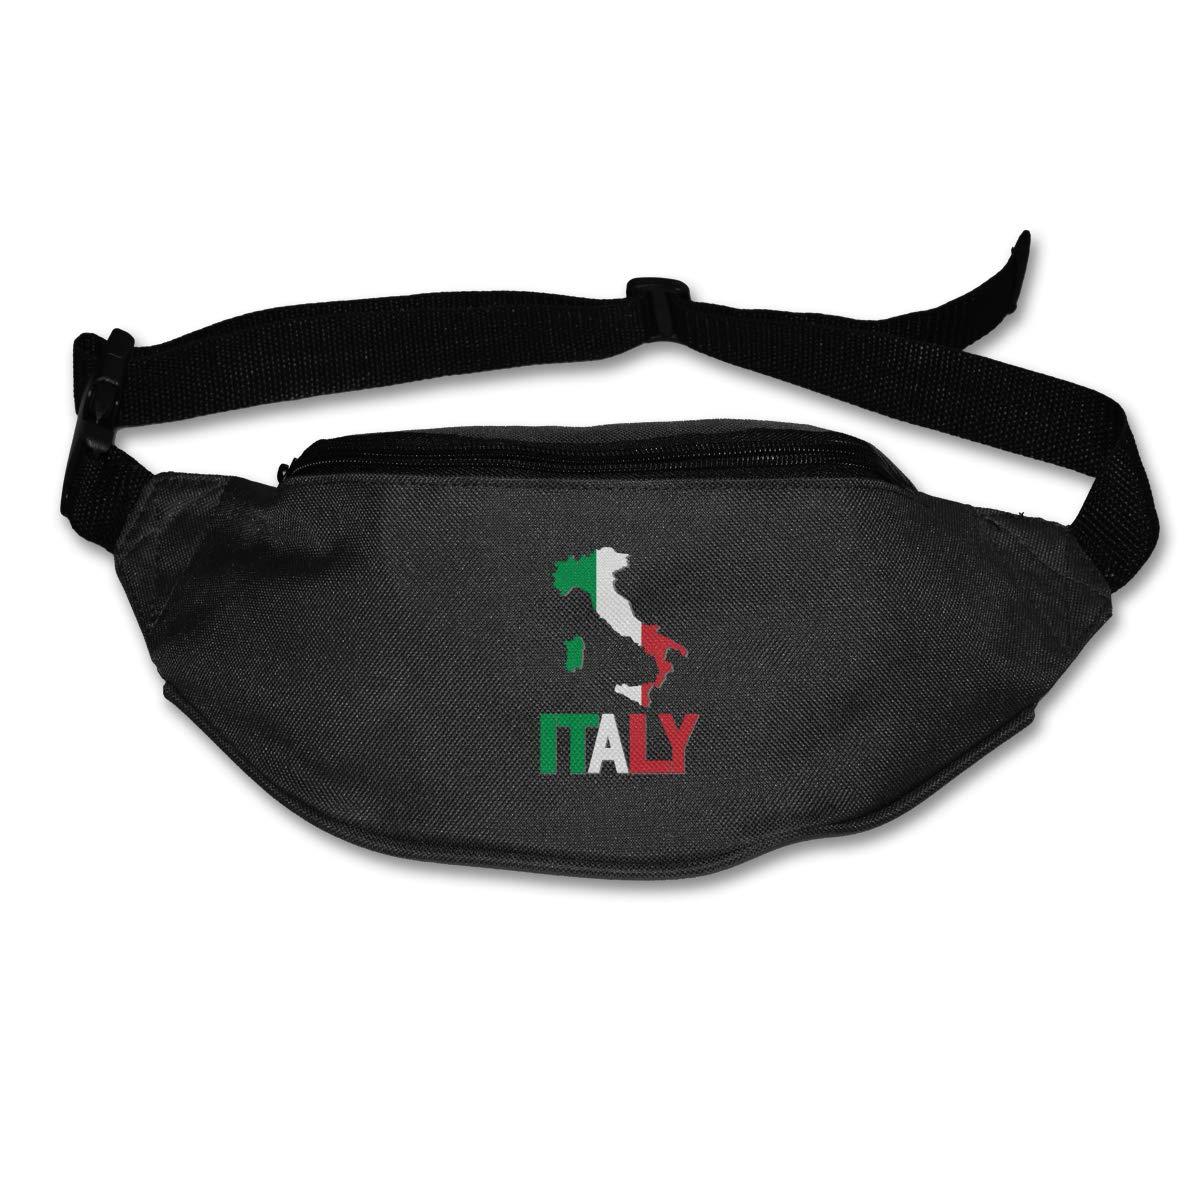 Italy Map Flag Sport Waist Bag Fanny Pack Adjustable For Run